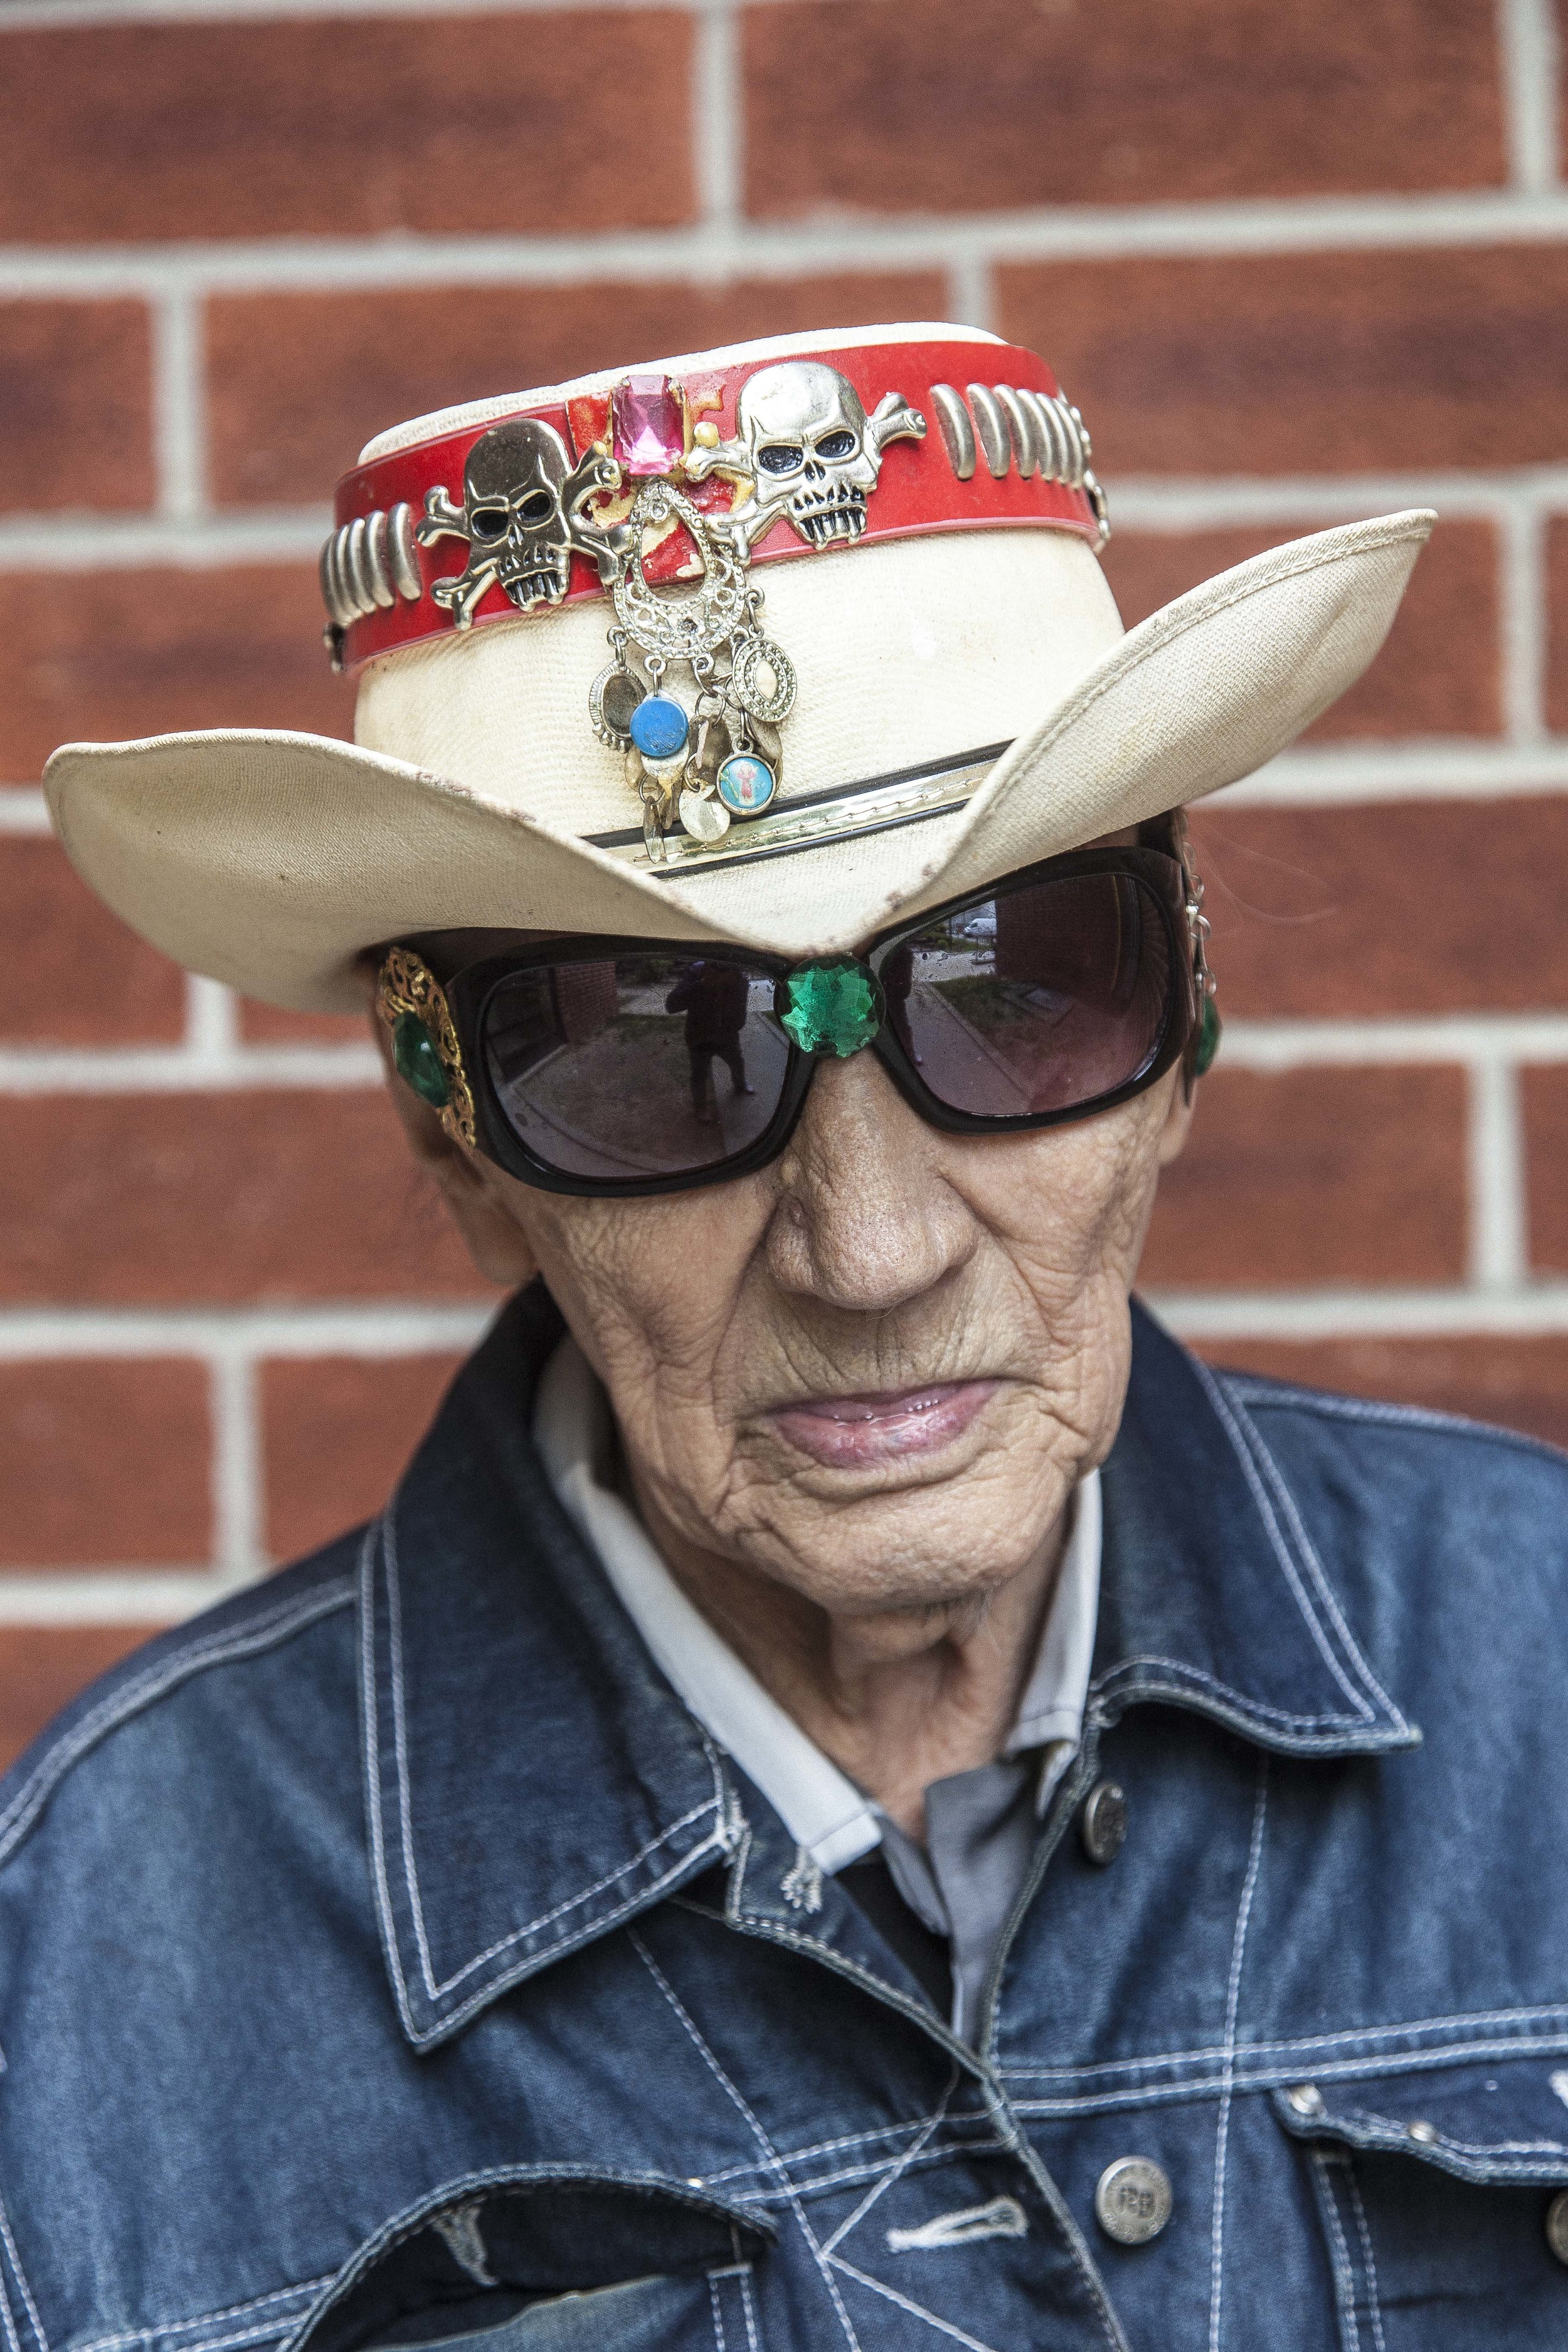 Jose - Pio Mendez Resident. Bronx, NYC. May 2015.